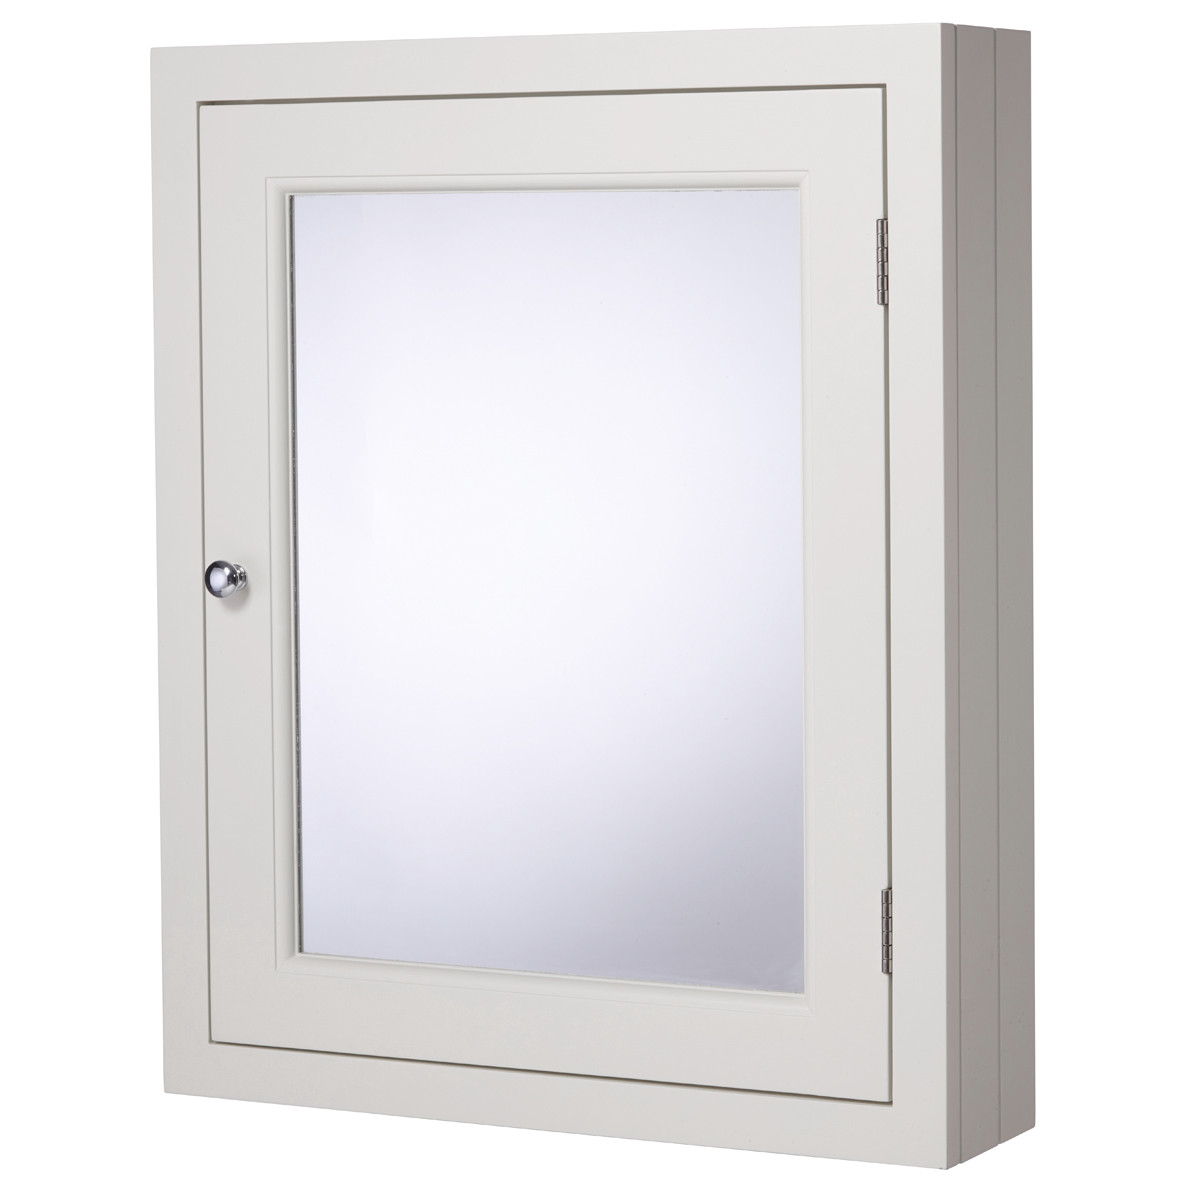 roper rhodes hampton 565mm chalk white mirrored door bathroom cabinet